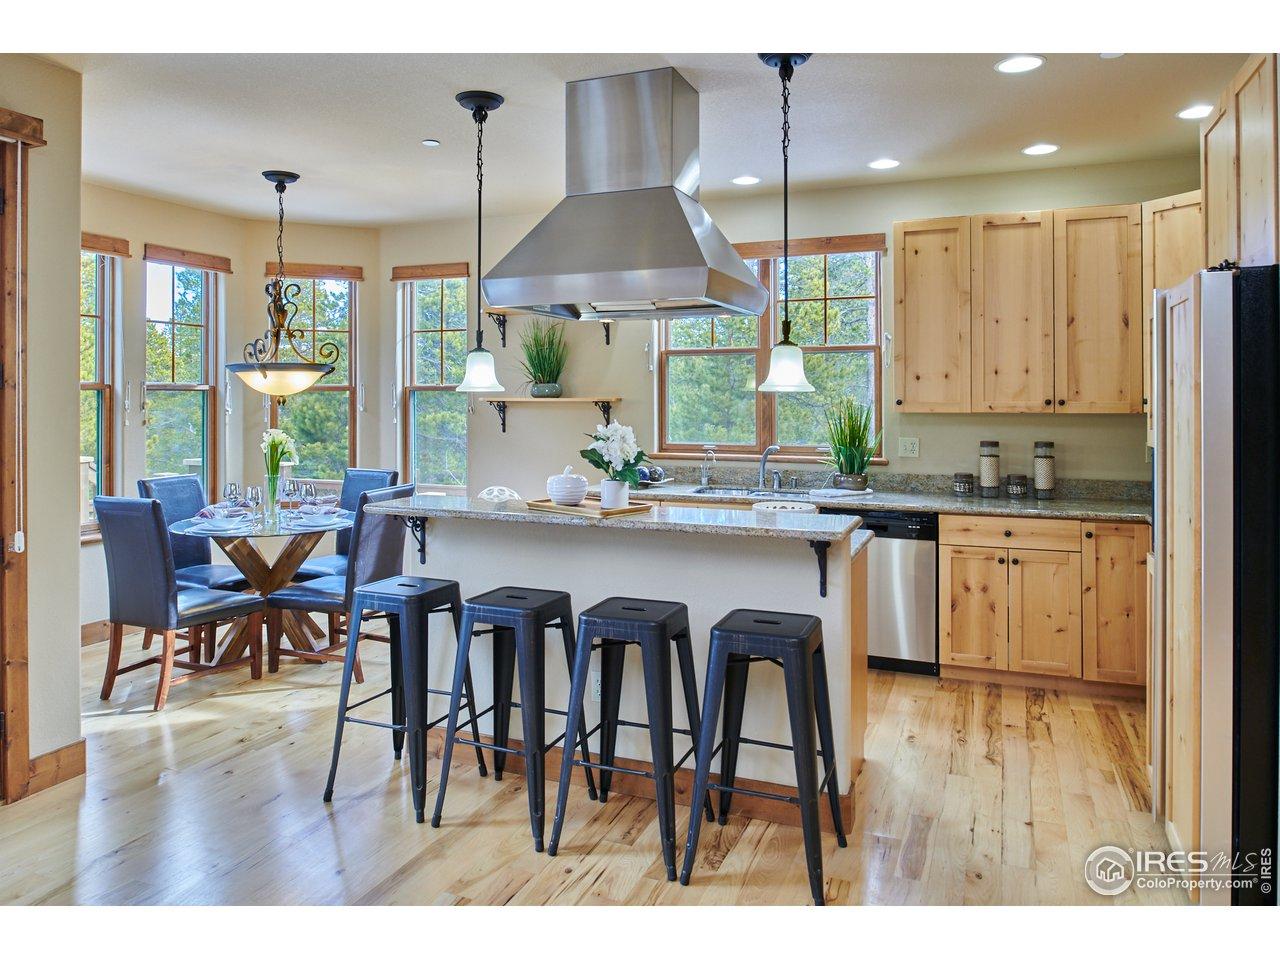 Gorgeous Kitchen with Alder Cabinets